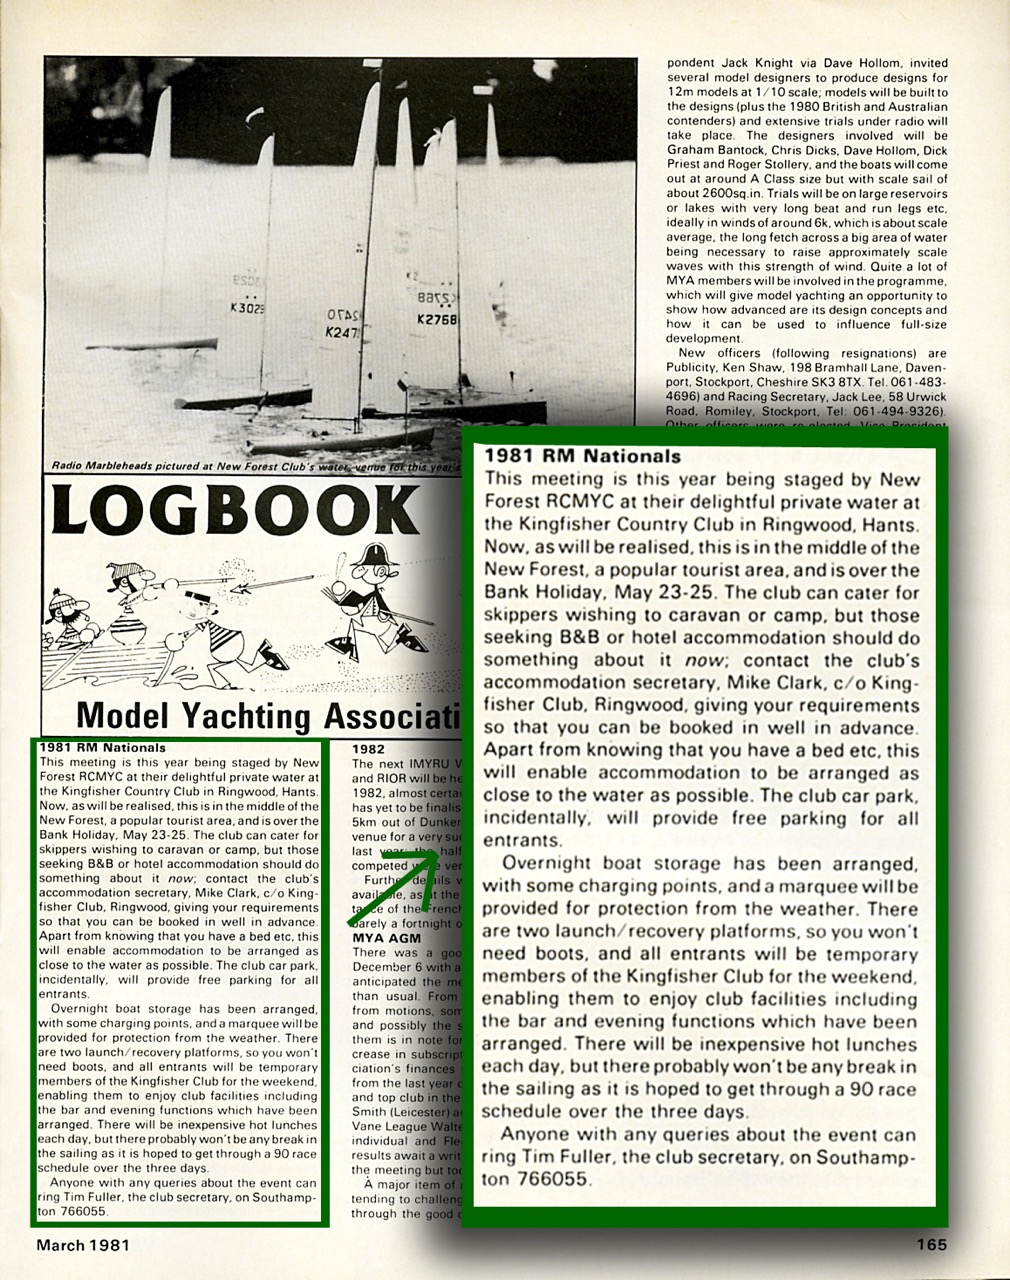 March 1981: RM Nats details